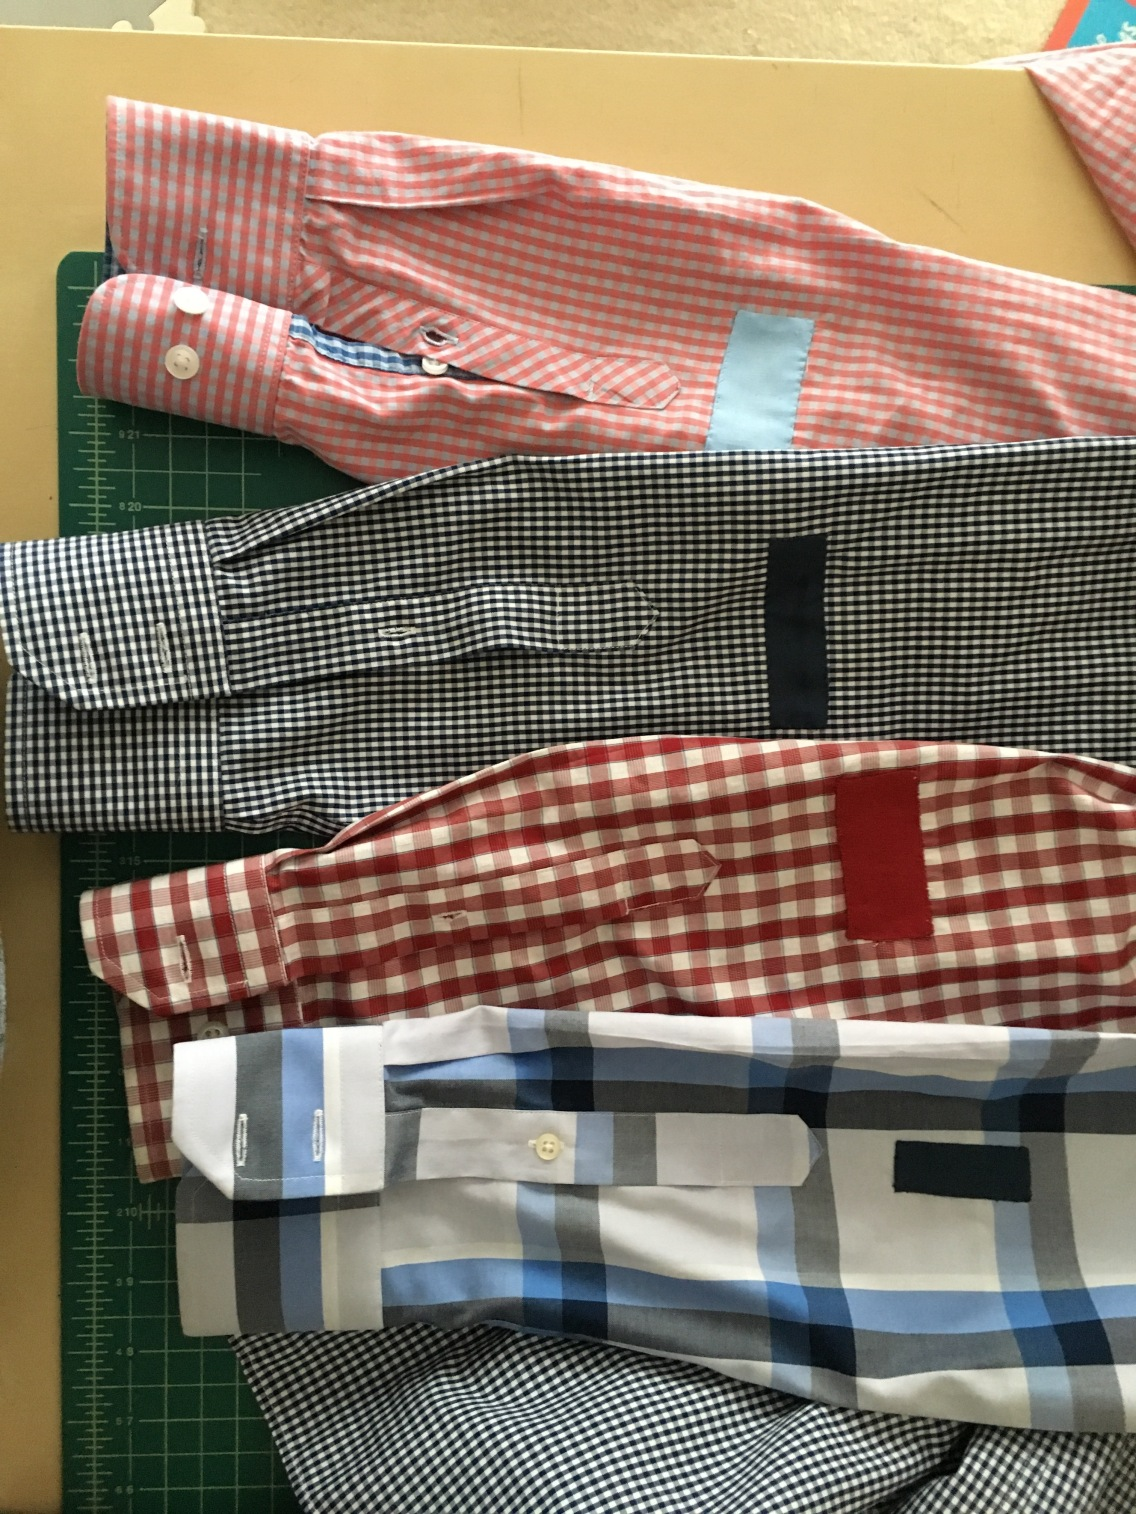 Mending Shirts